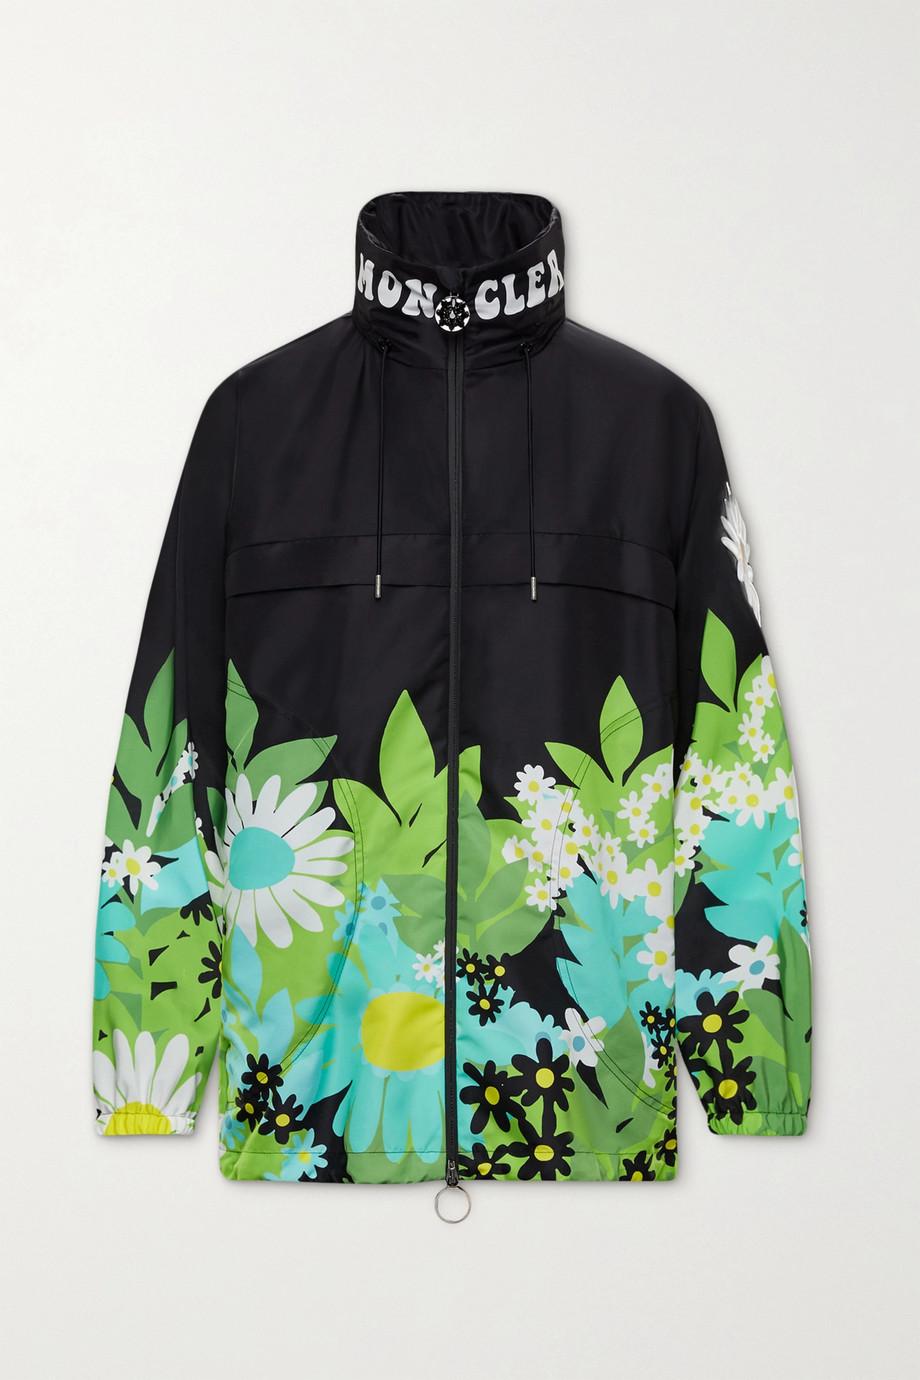 Moncler Genius + 8 Richard Quinn Pat floral-print shell jacket